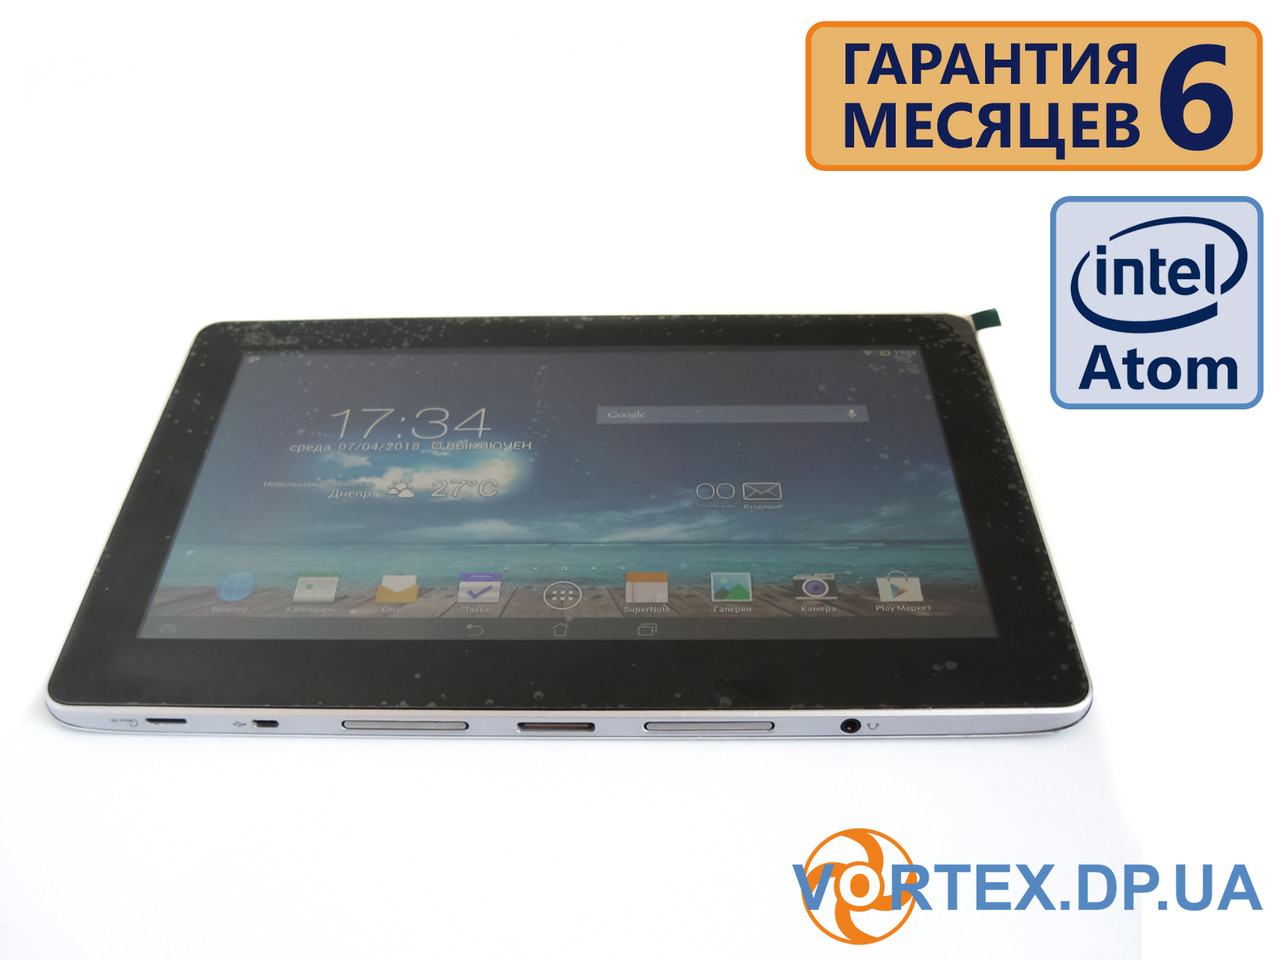 Планшет ASUS TX201LA 11.6 IPS (1920x1080) / Intel Atom Z2560 (2x1.6GHz